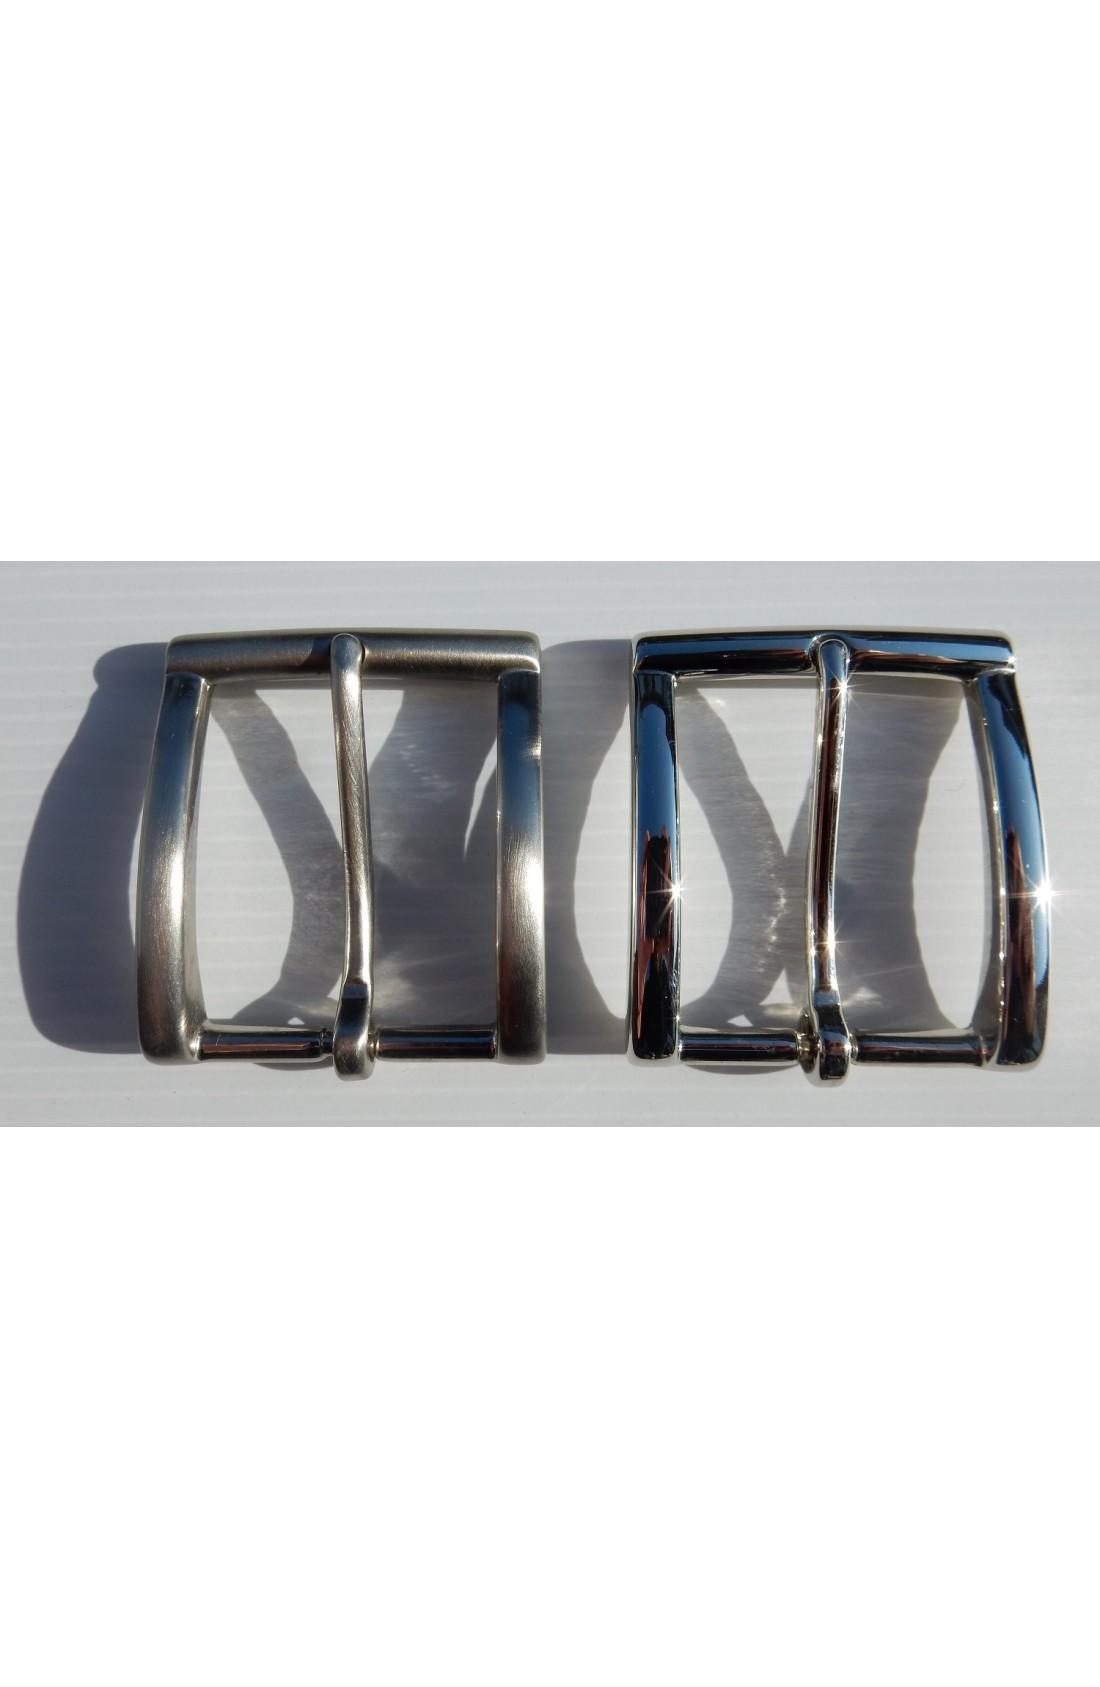 Fibbia Standard I 113 mm.35 nikel e nikel satinato (2)